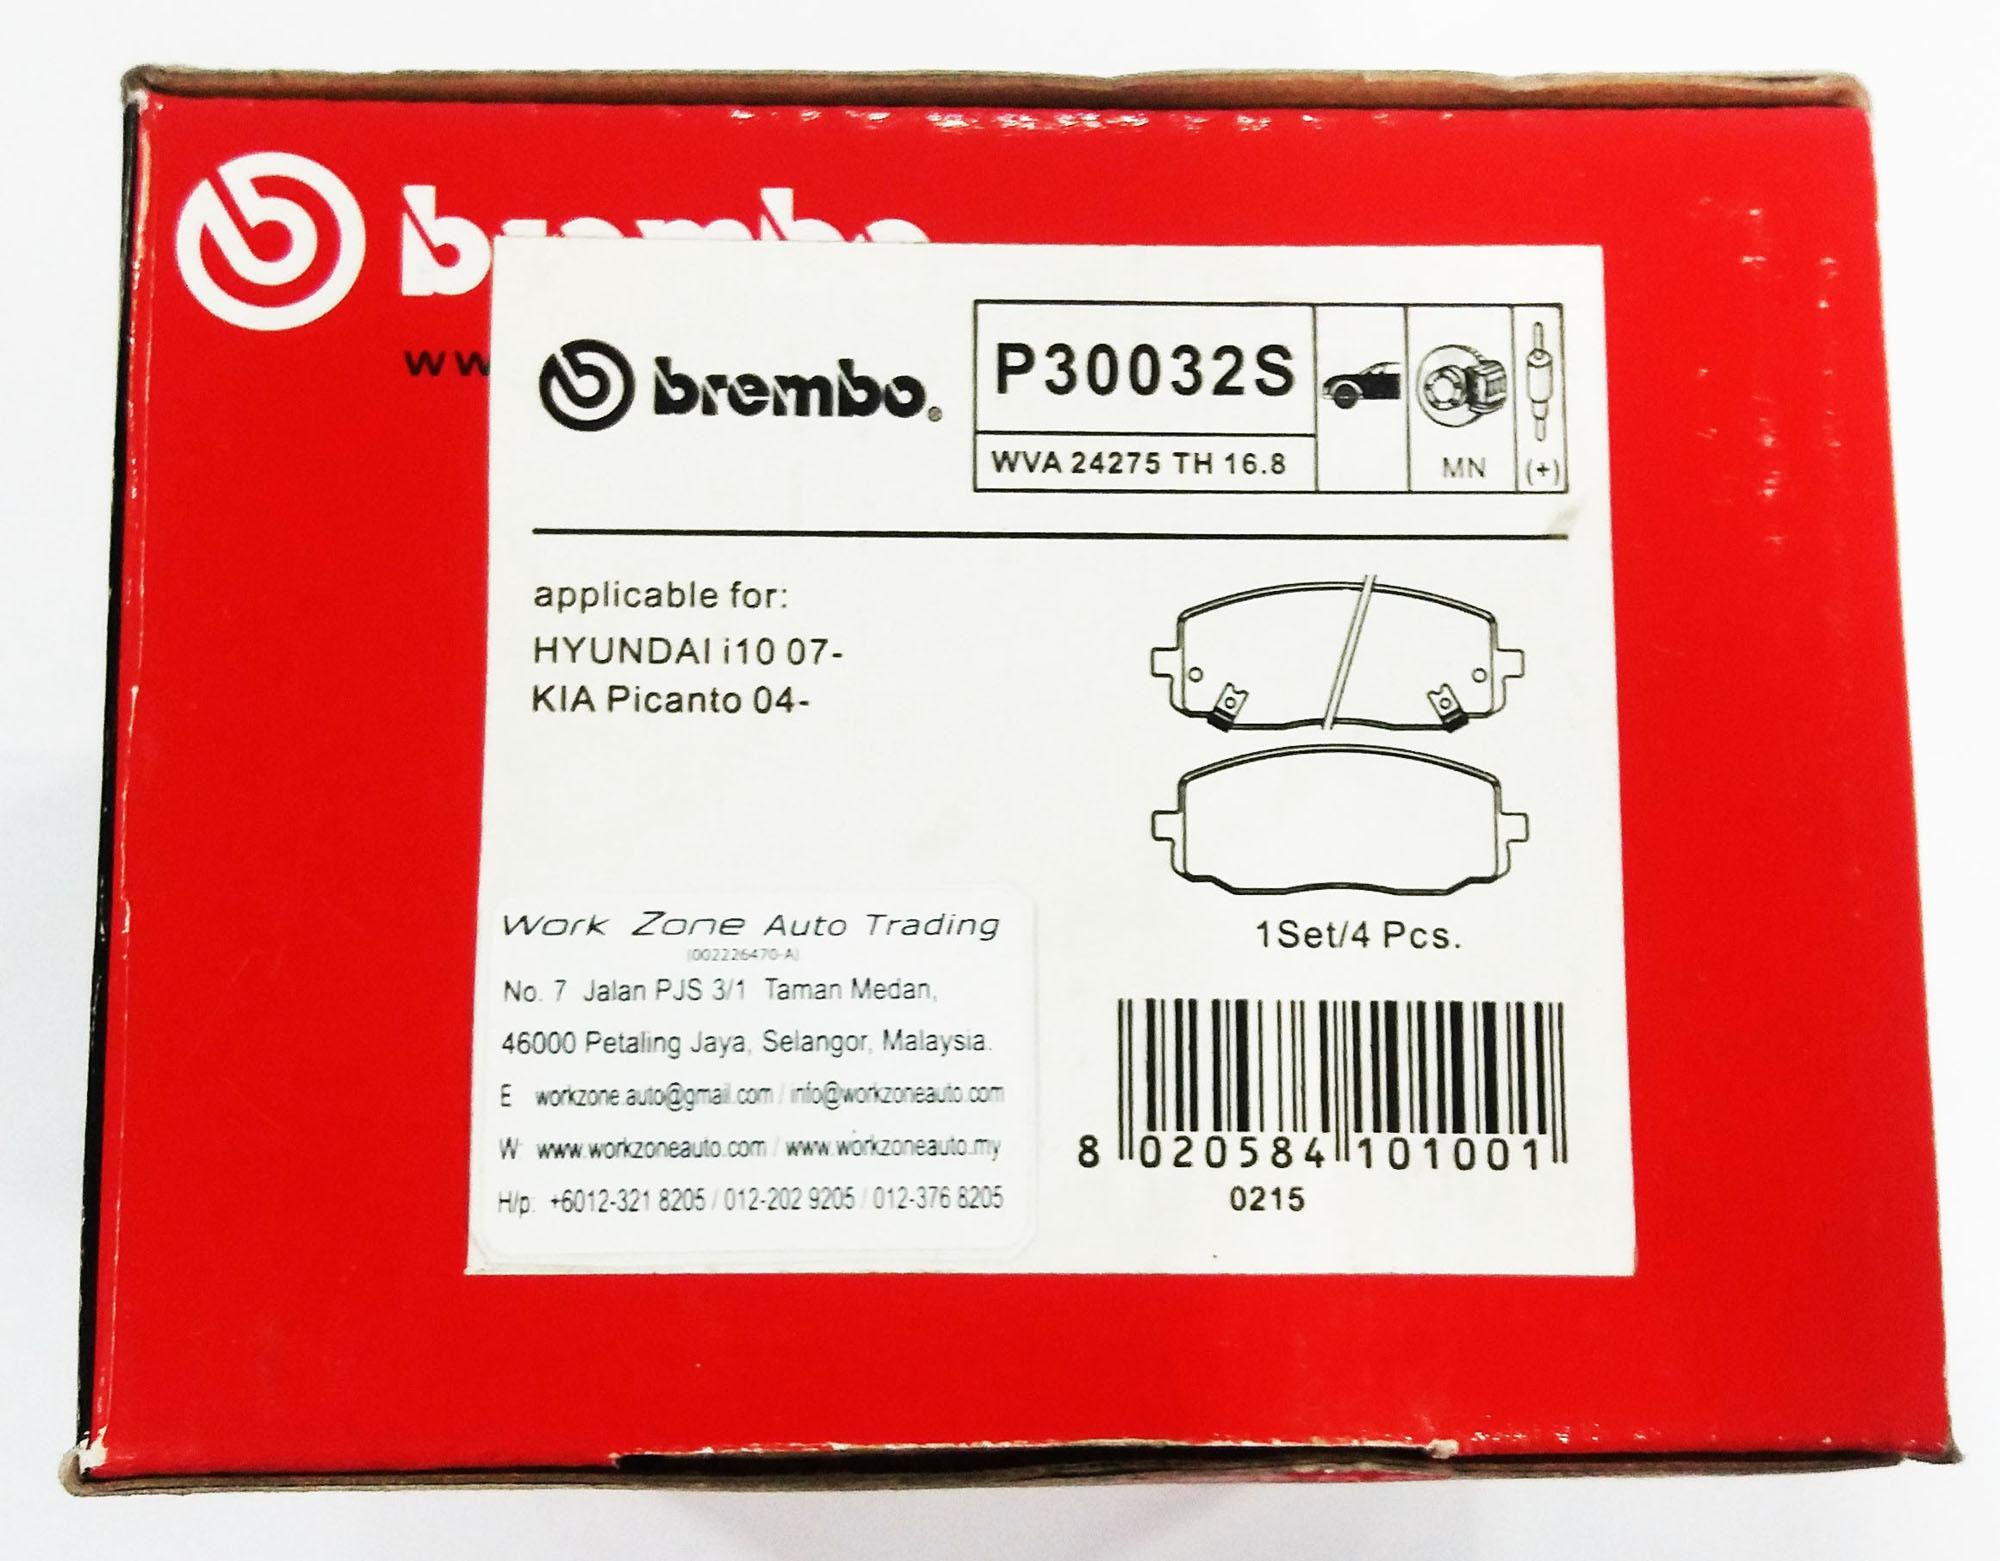 FOR KIA PICANTO 1.0 BI FUEL LPG 1.1 CRDi 1.2 QUALITY BRAND NEW REAR BRAKE PADS